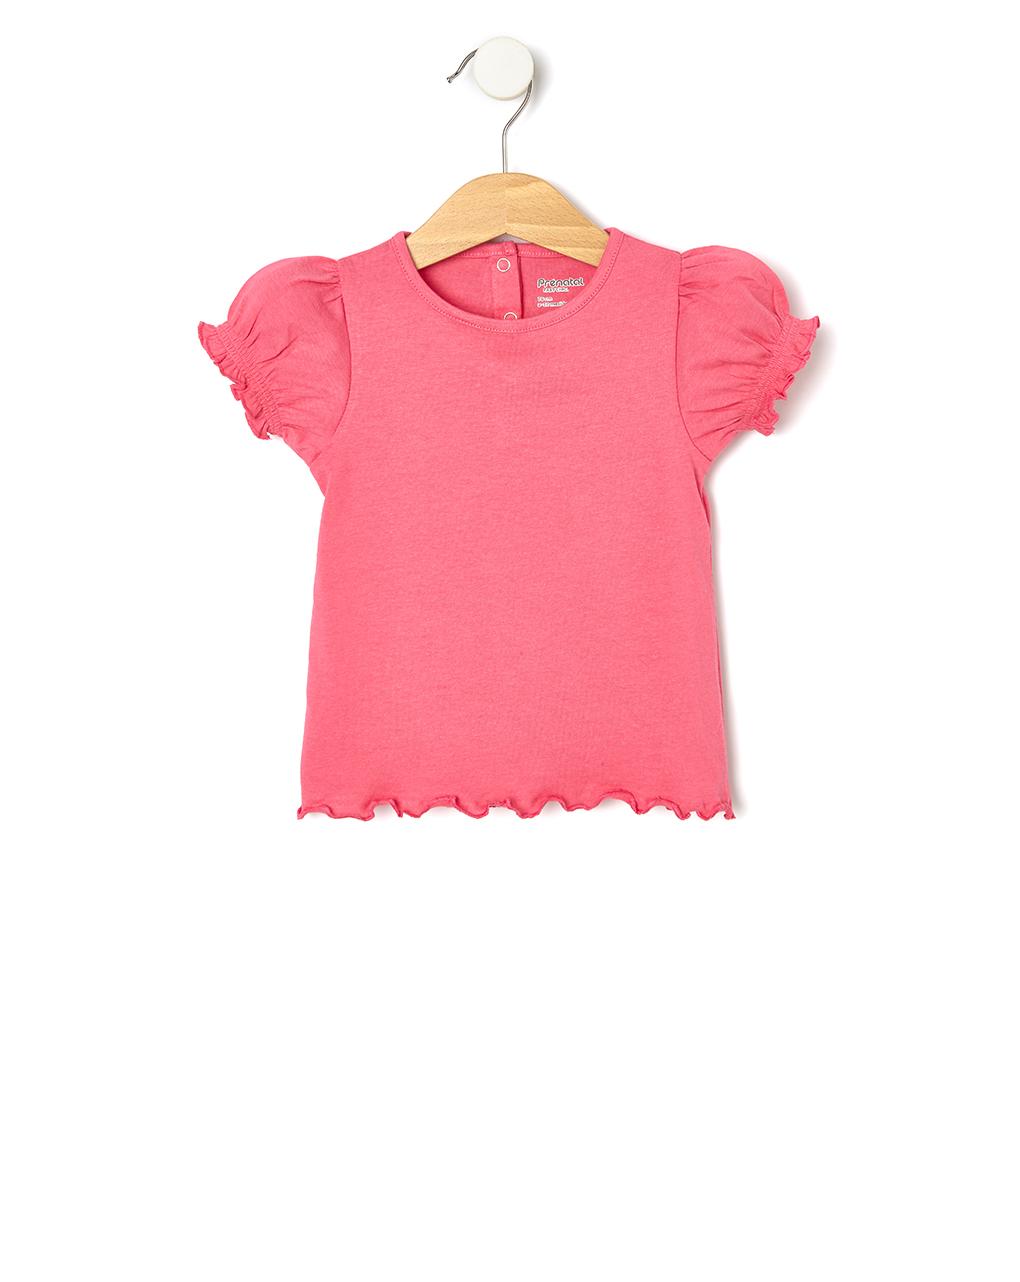 T-Shirt Jersey Φούξια για Κορίτσι